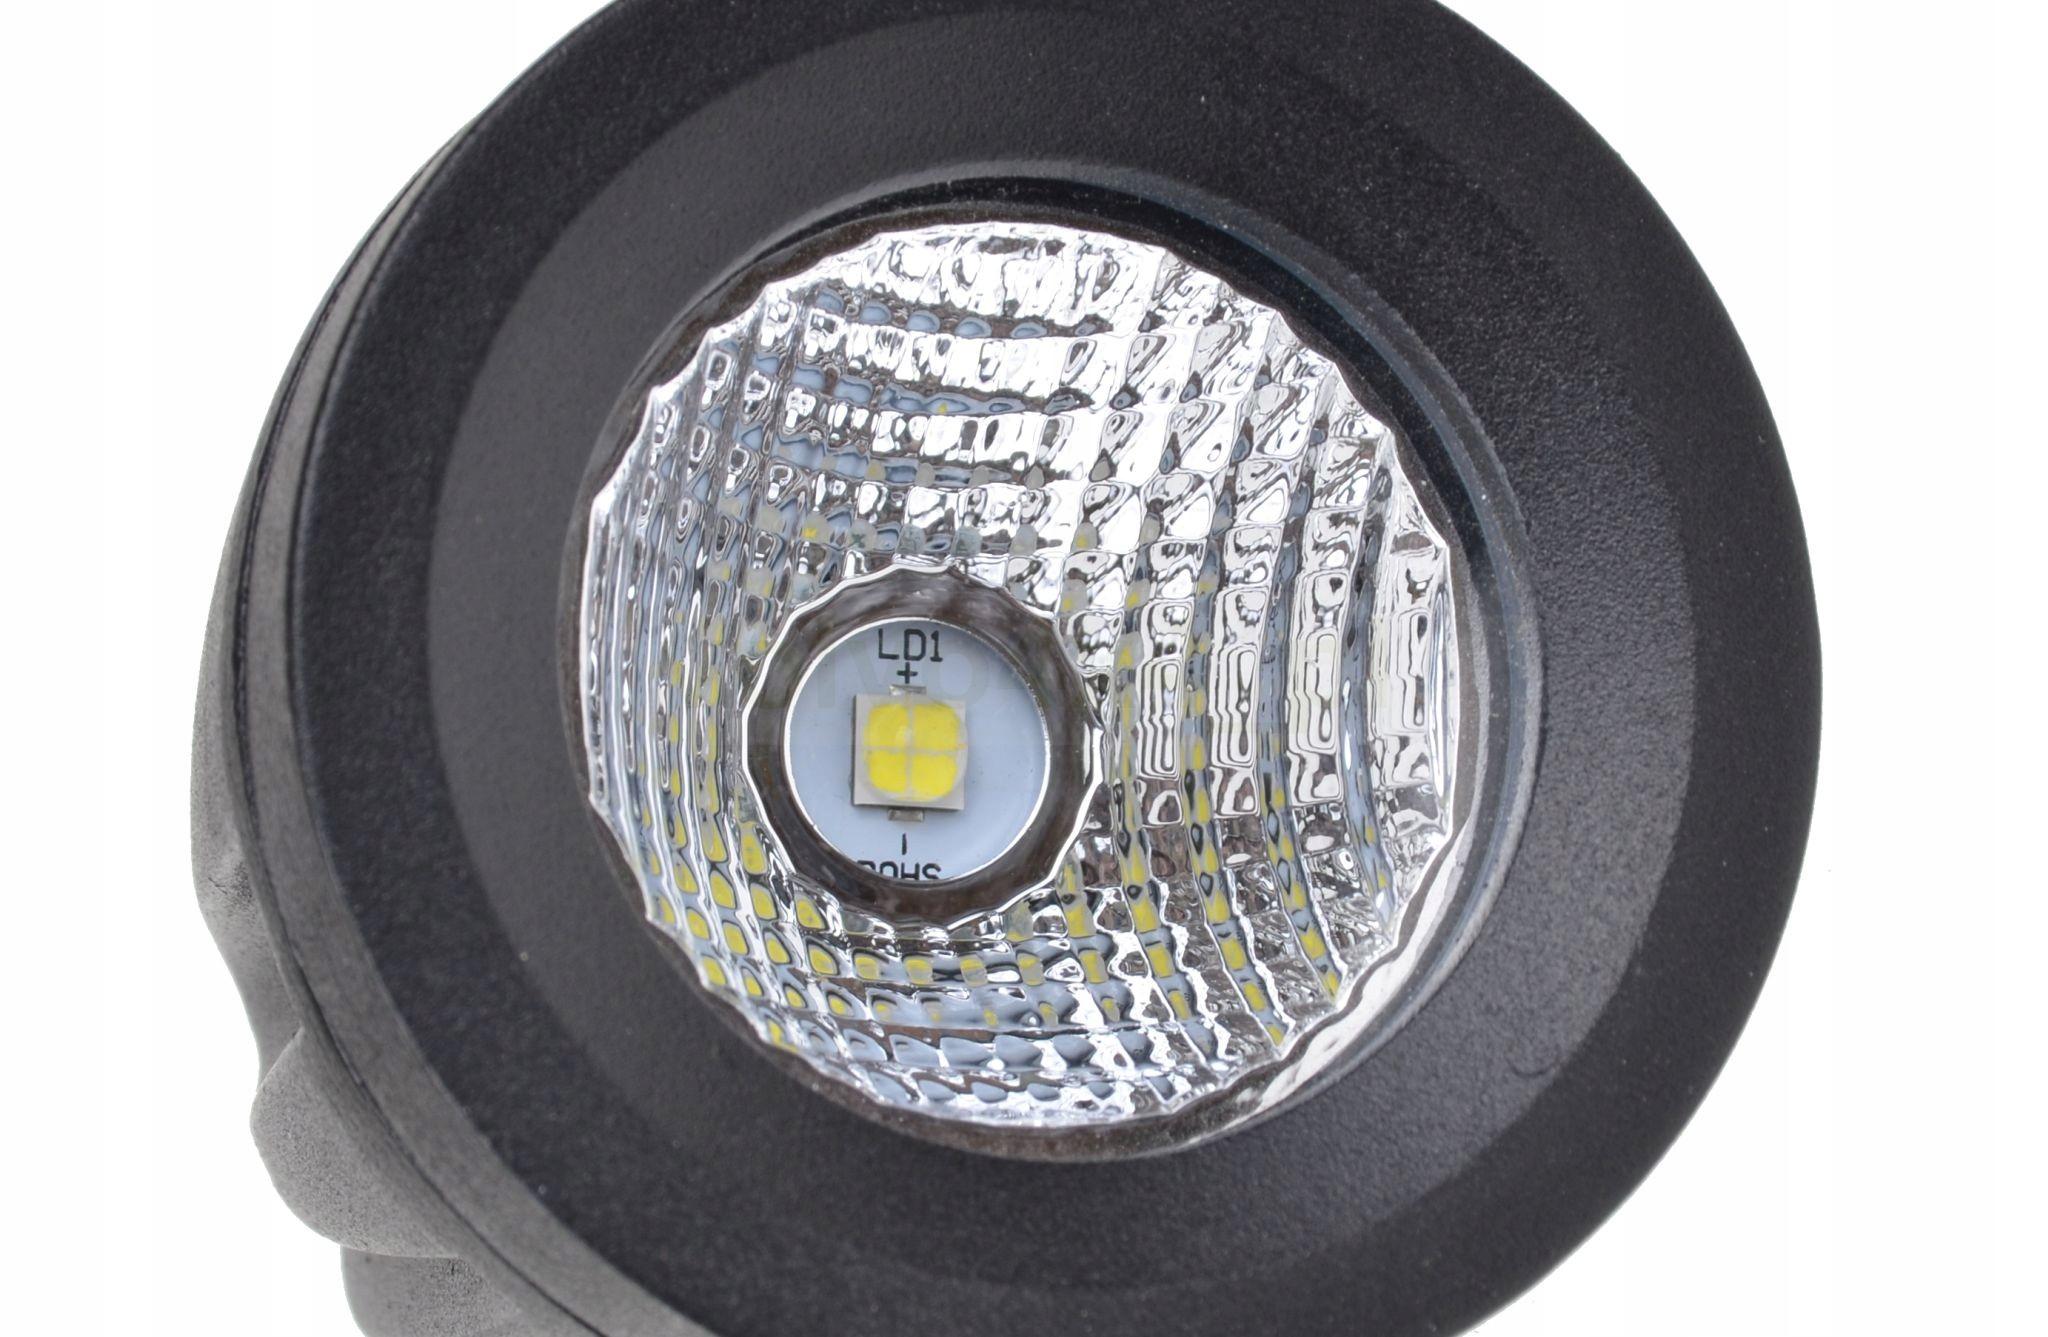 Мини лампа рефлектор про Кри 20W Сид собой смесь 67мм